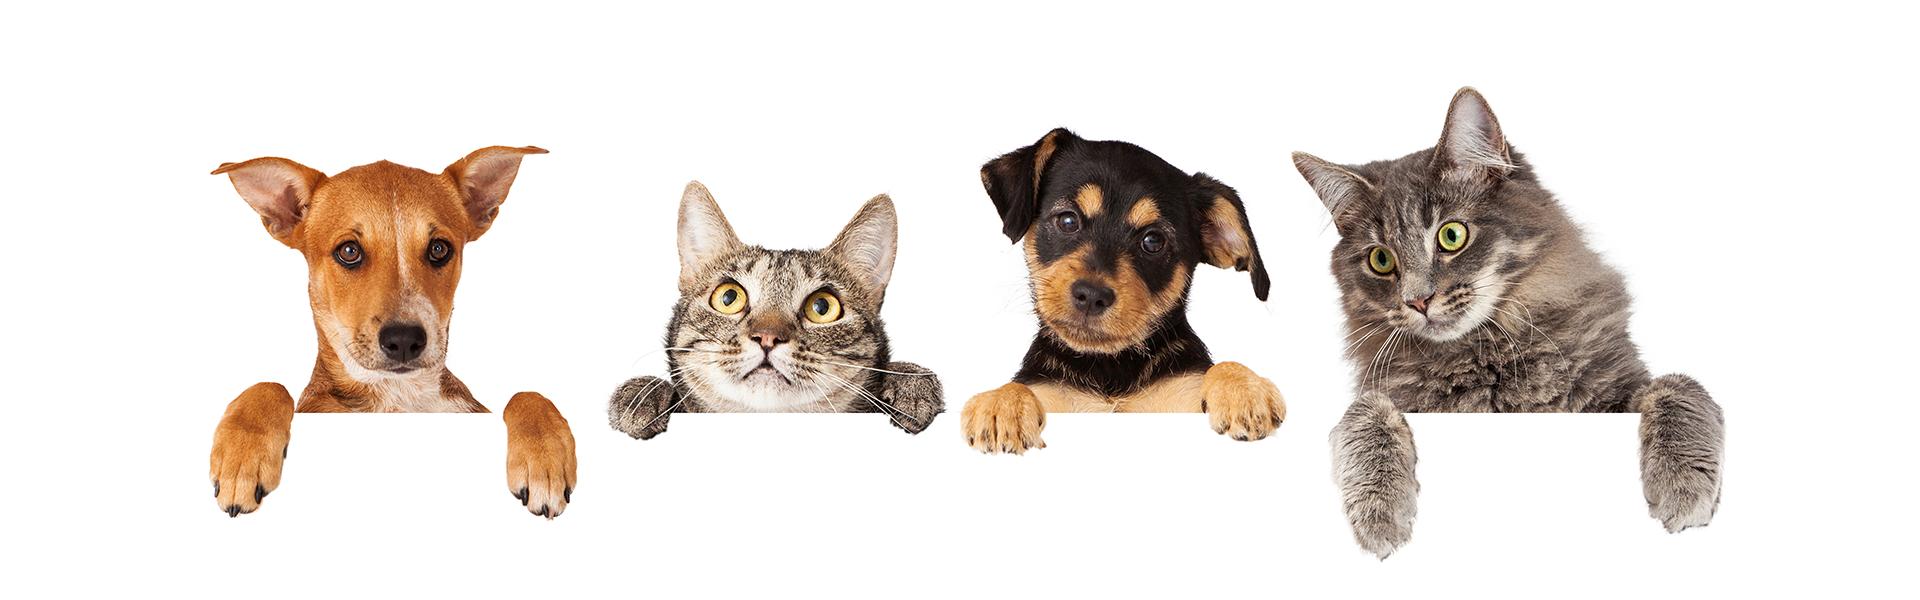 Pets Veterinarian Academy Animal Hospital Greenwood Indianapolis Indiana